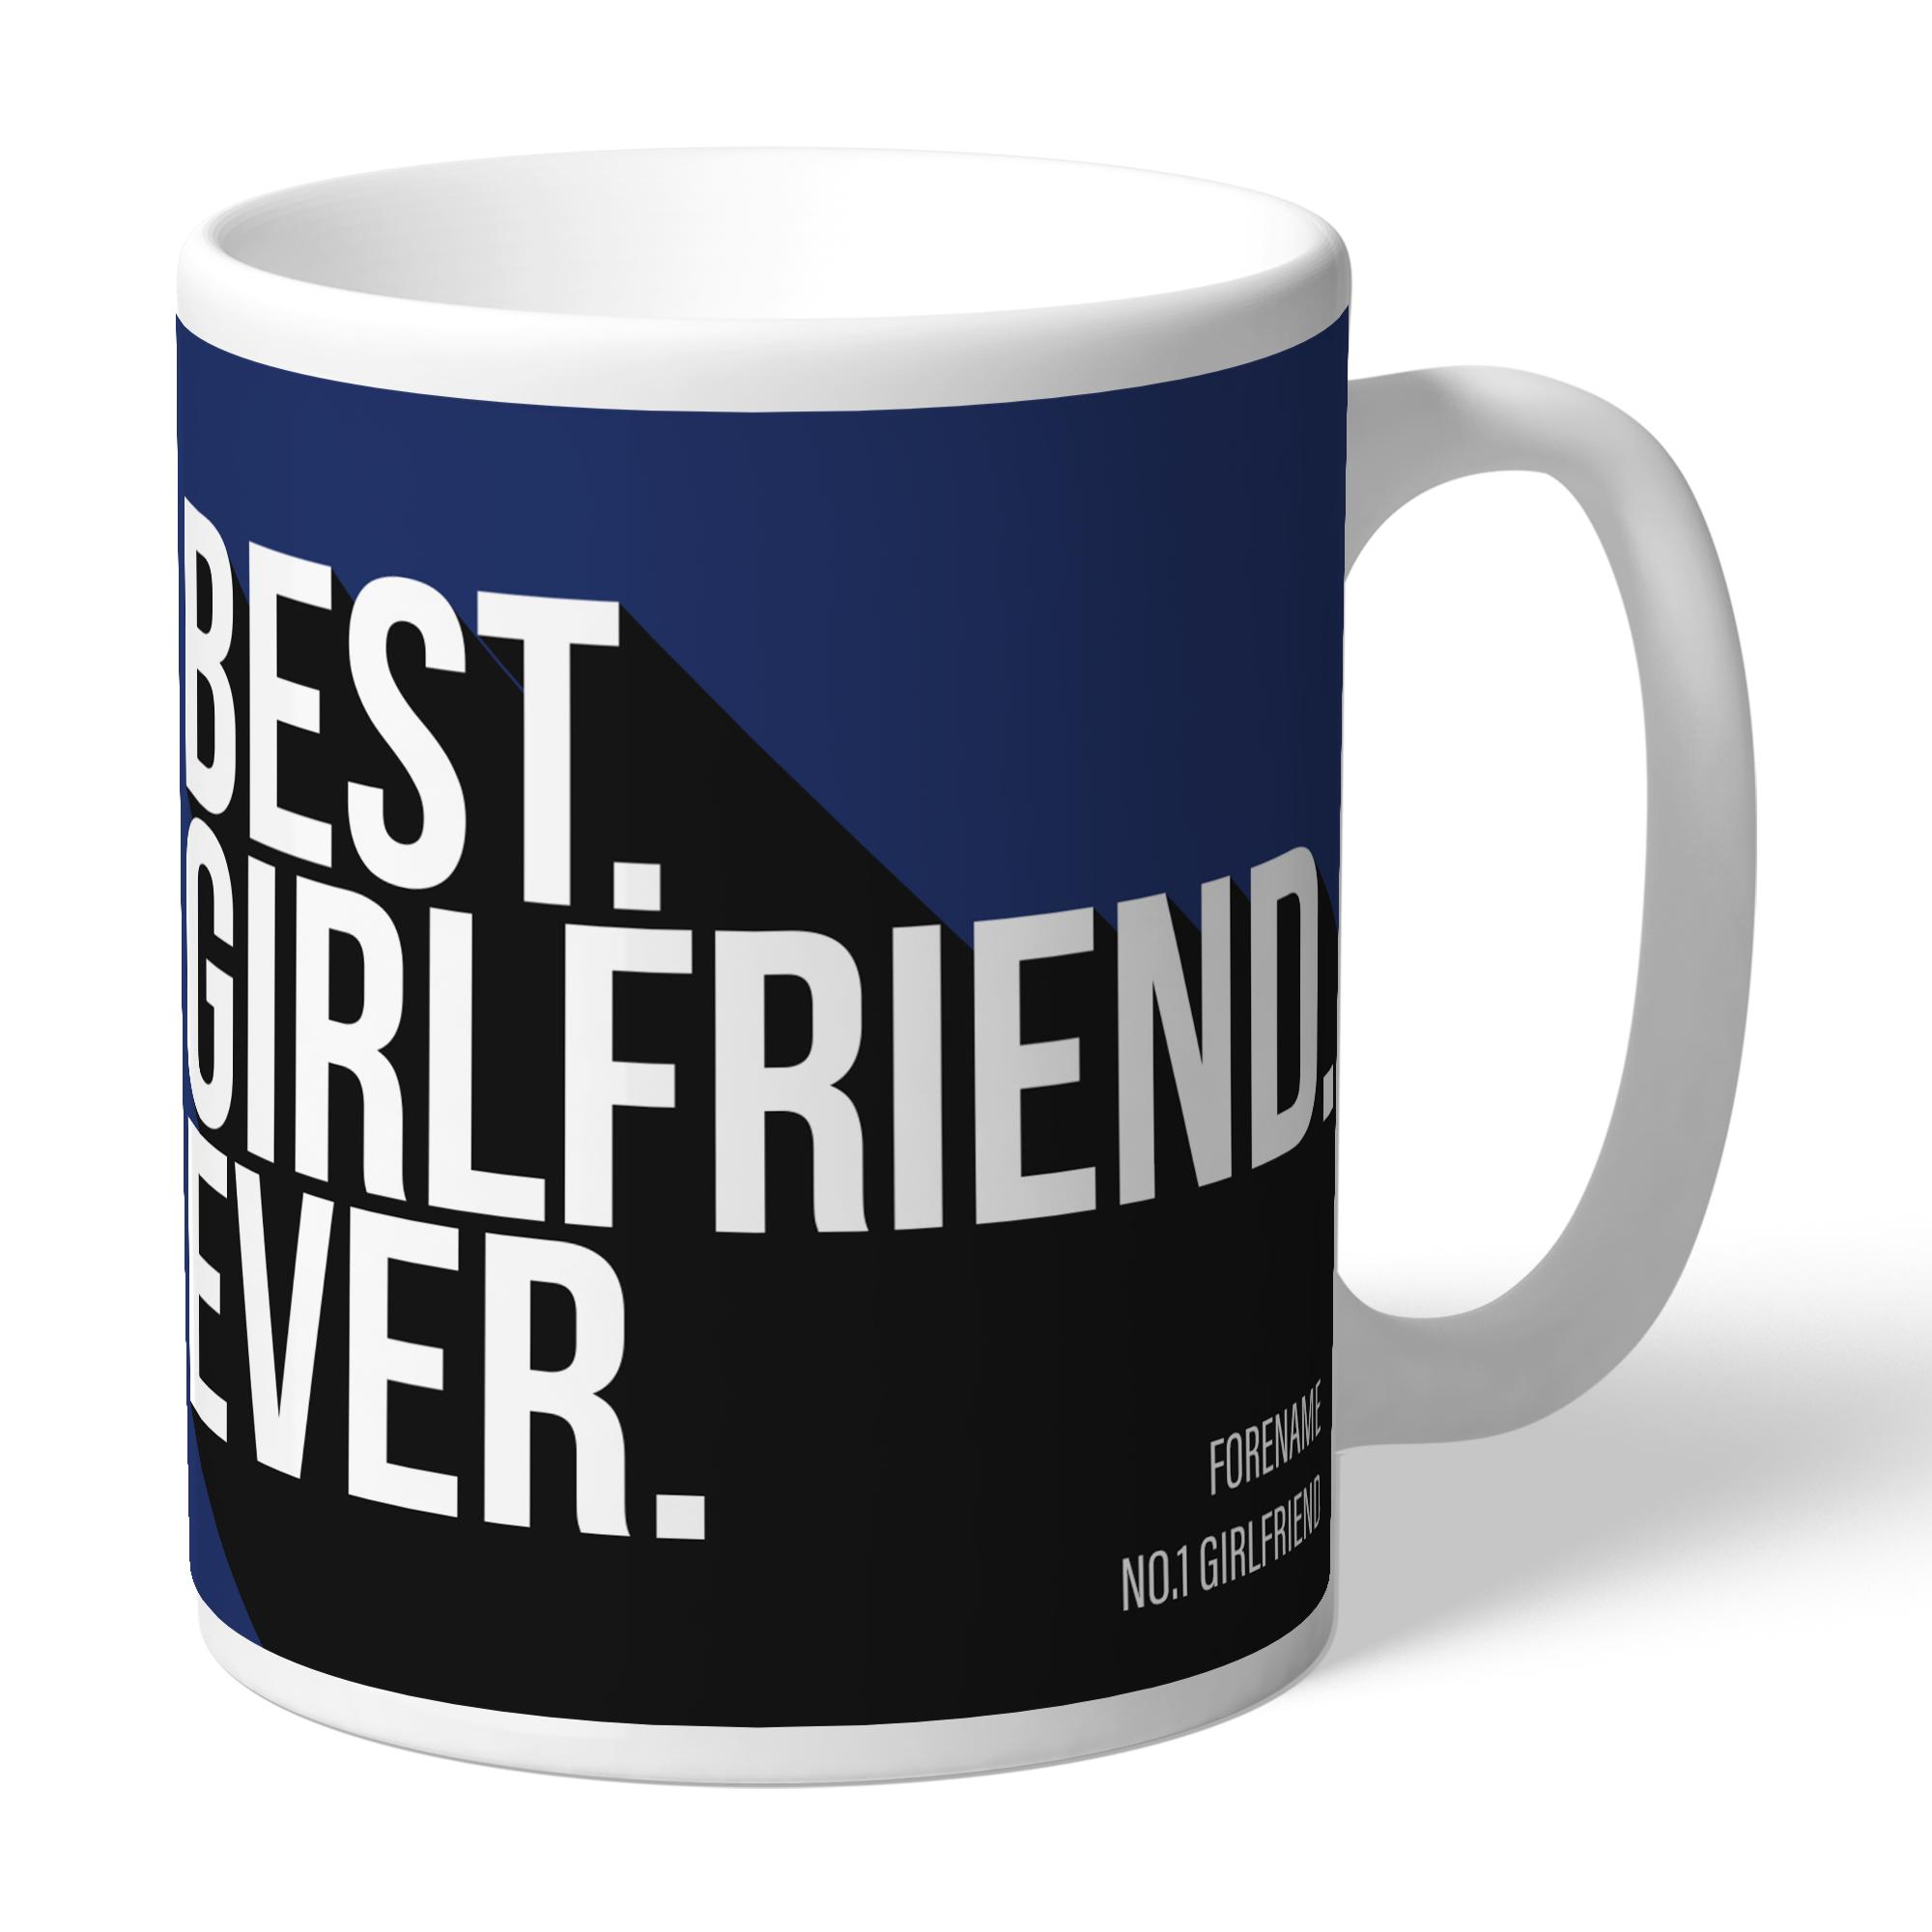 West Bromwich Albion FC Best Girlfriend Ever Mug